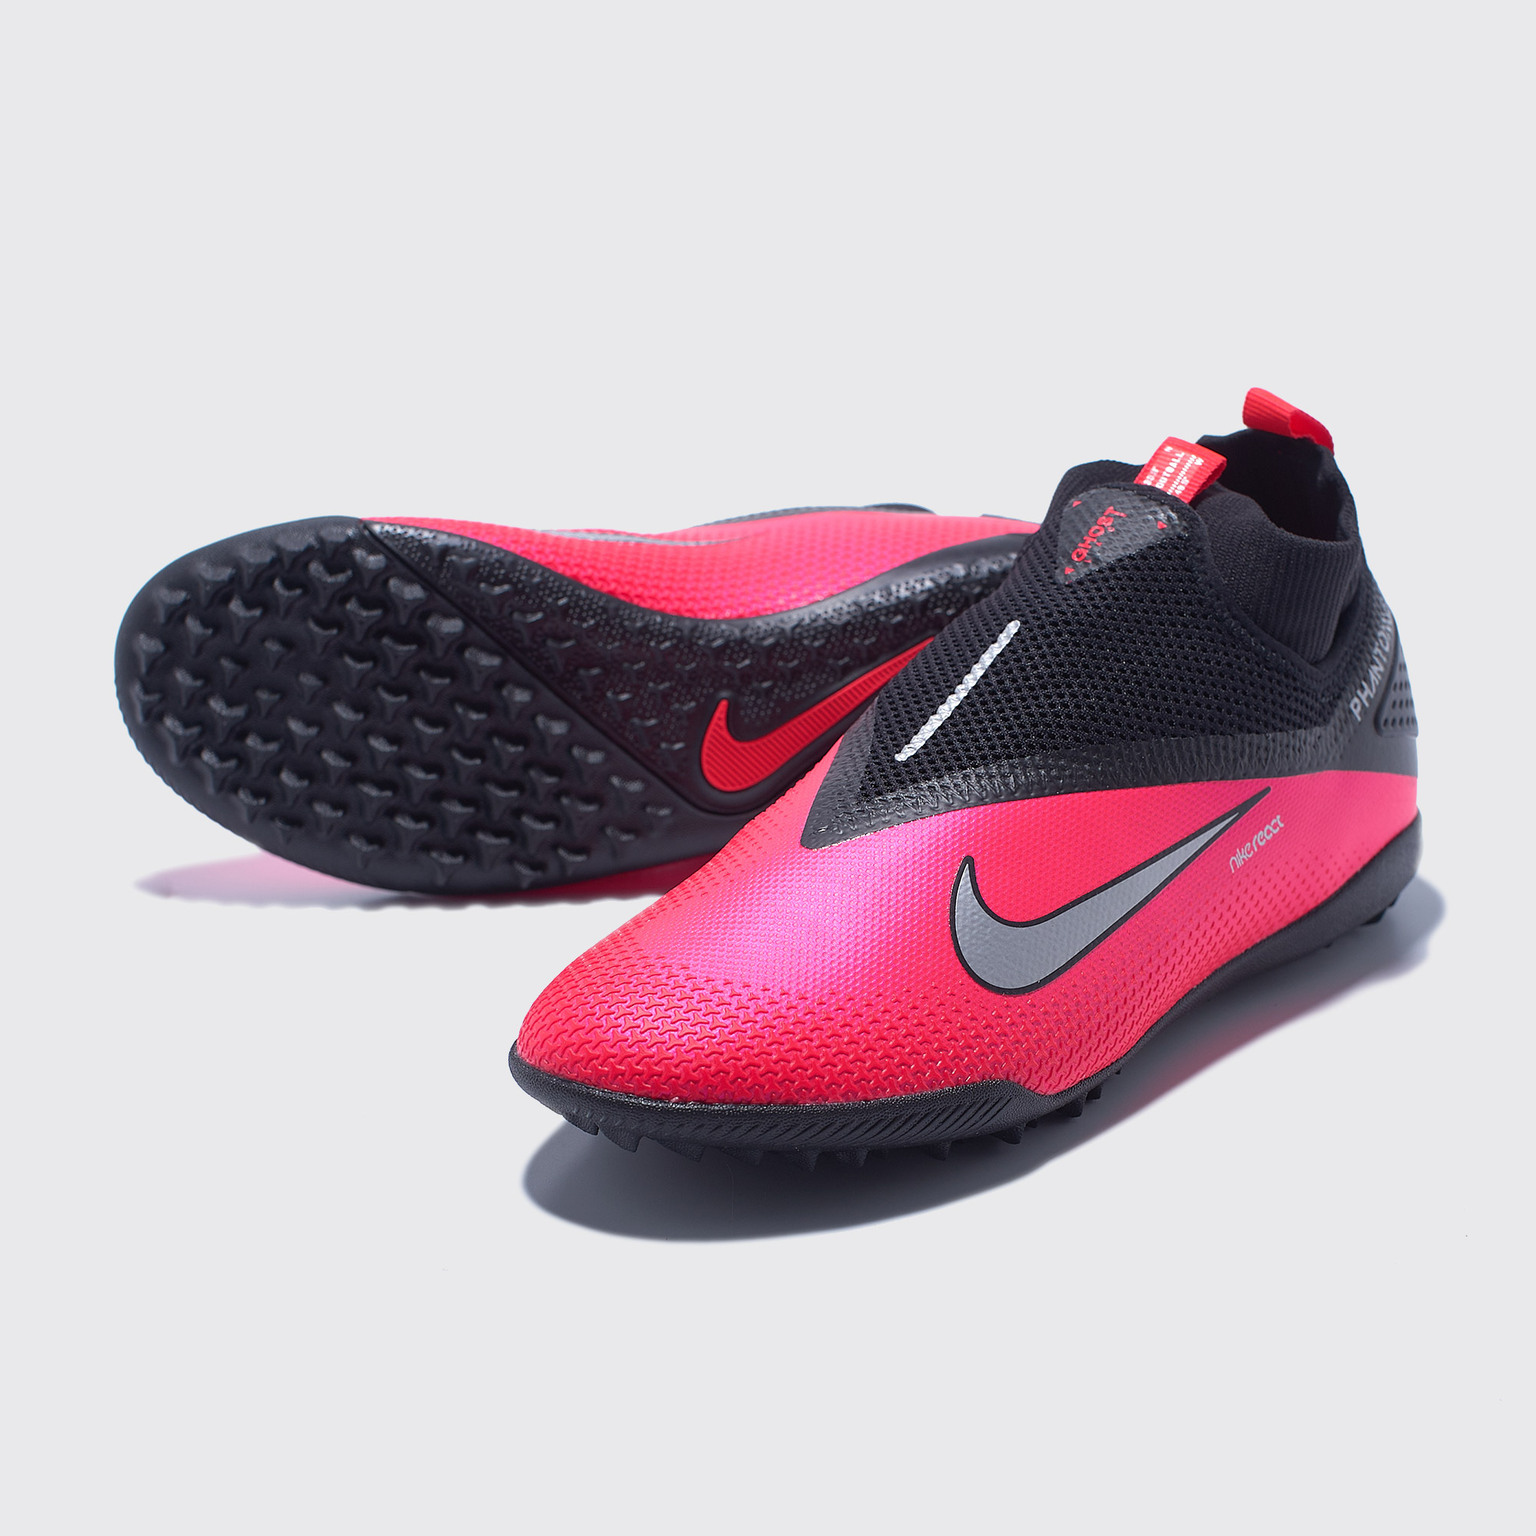 Шиповки Nike React Phantom Vision 2 Pro DF TF CD4174-606 шиповки детские nike phantom vision 2 academy df tf cd4078 606